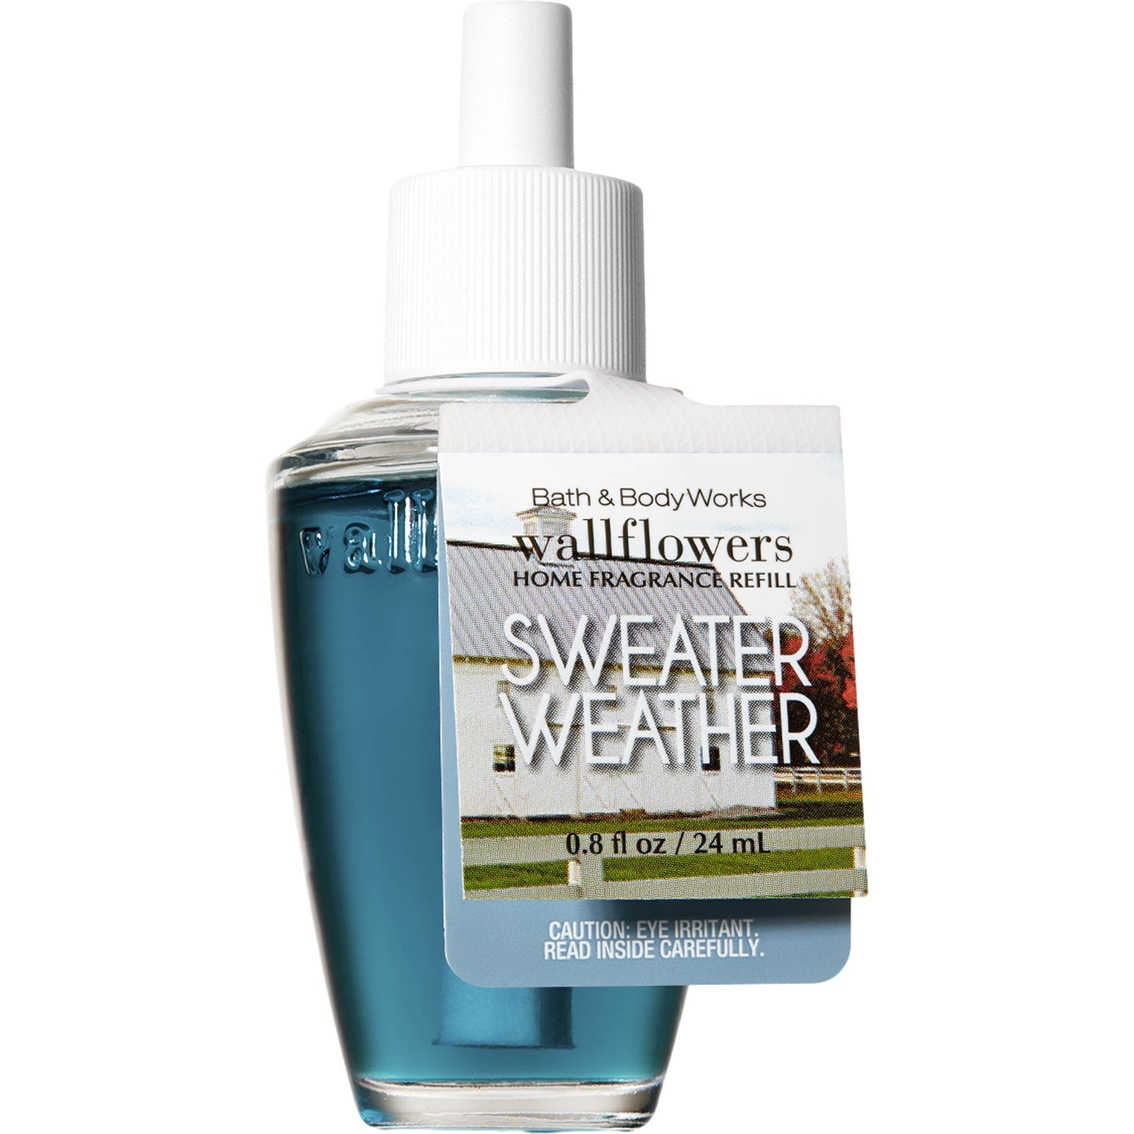 Bath Body Works Sweater Weather Wallflower Refill Home